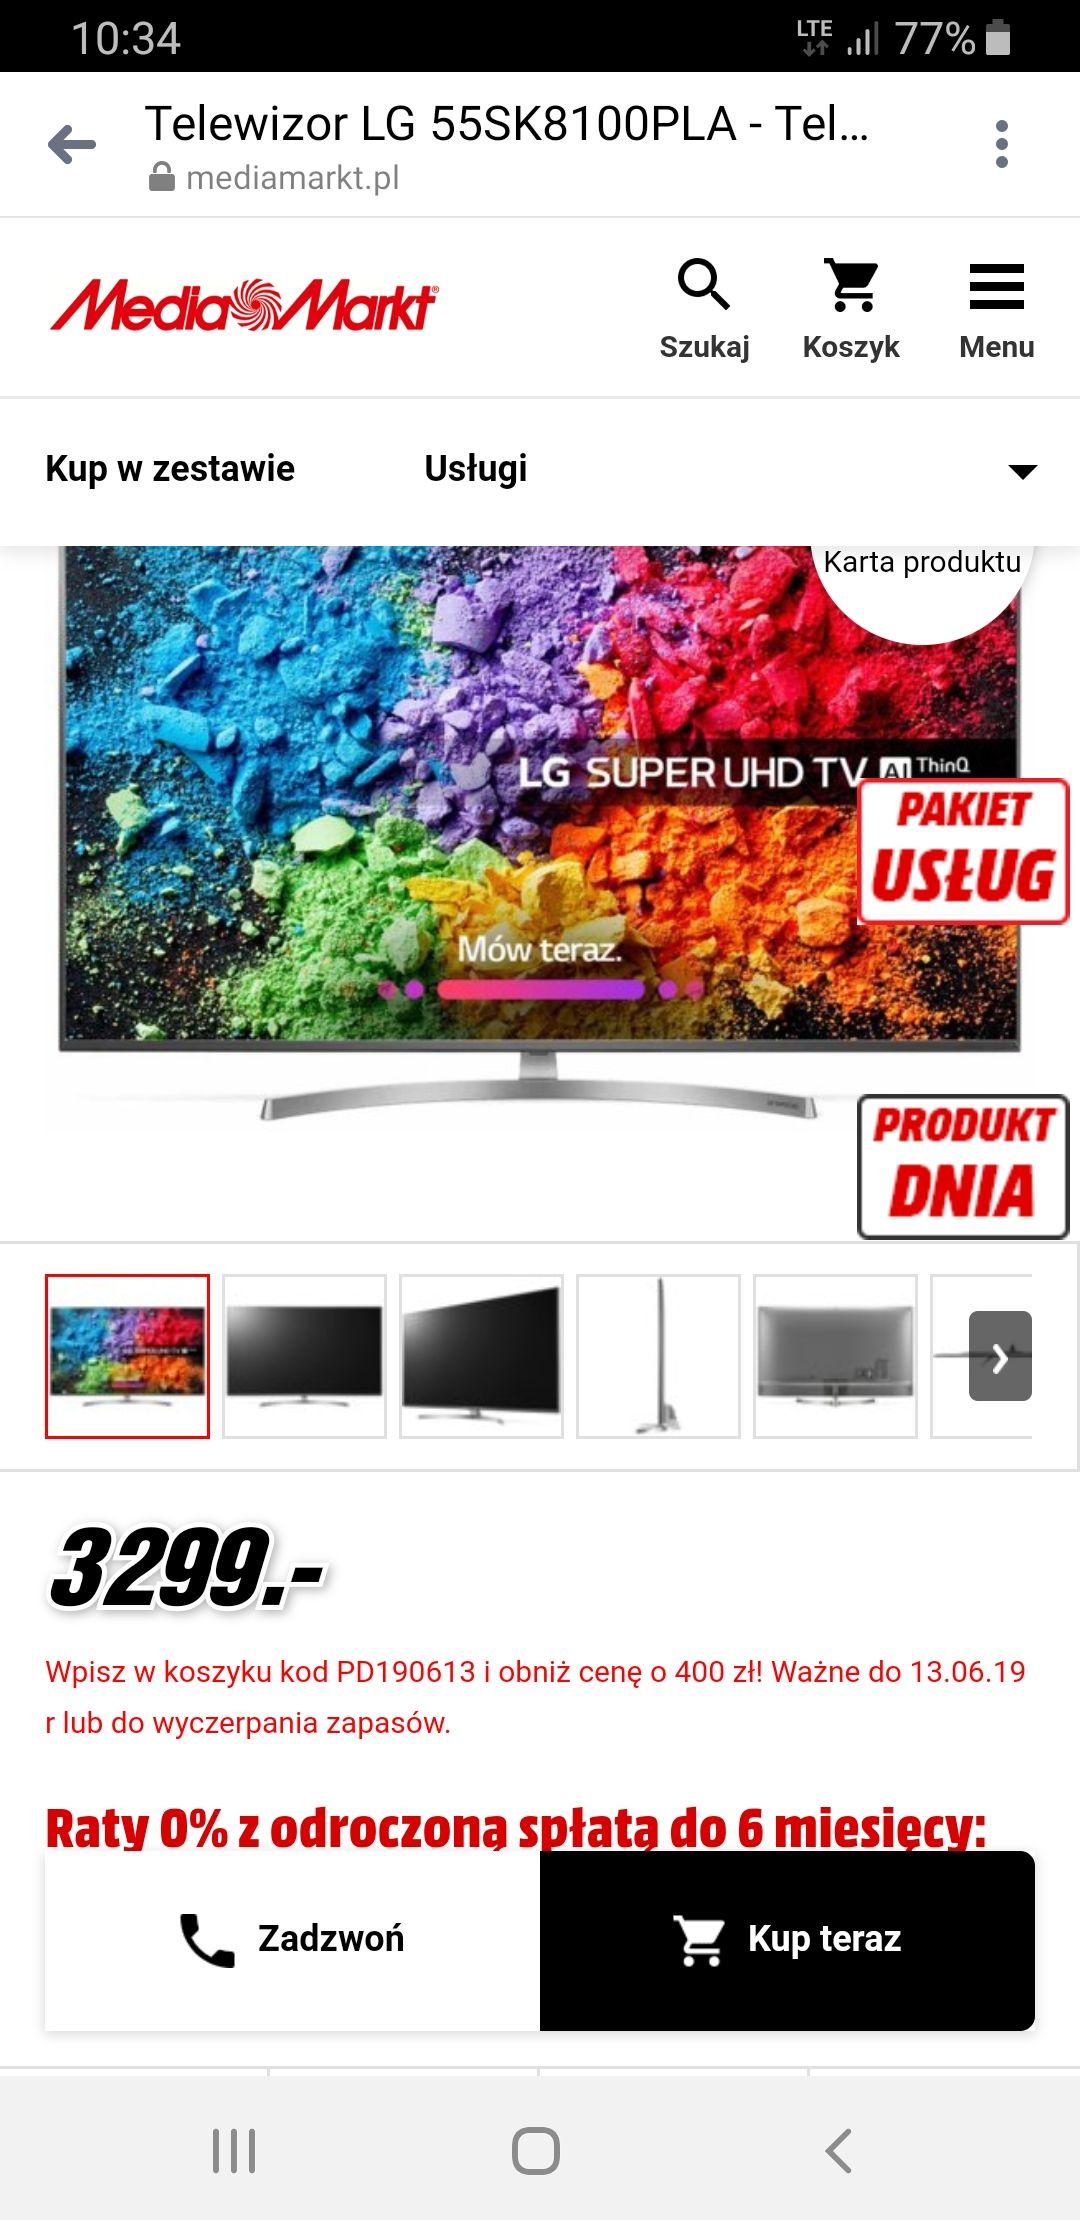 Telewizor LG 55SK8100PLA